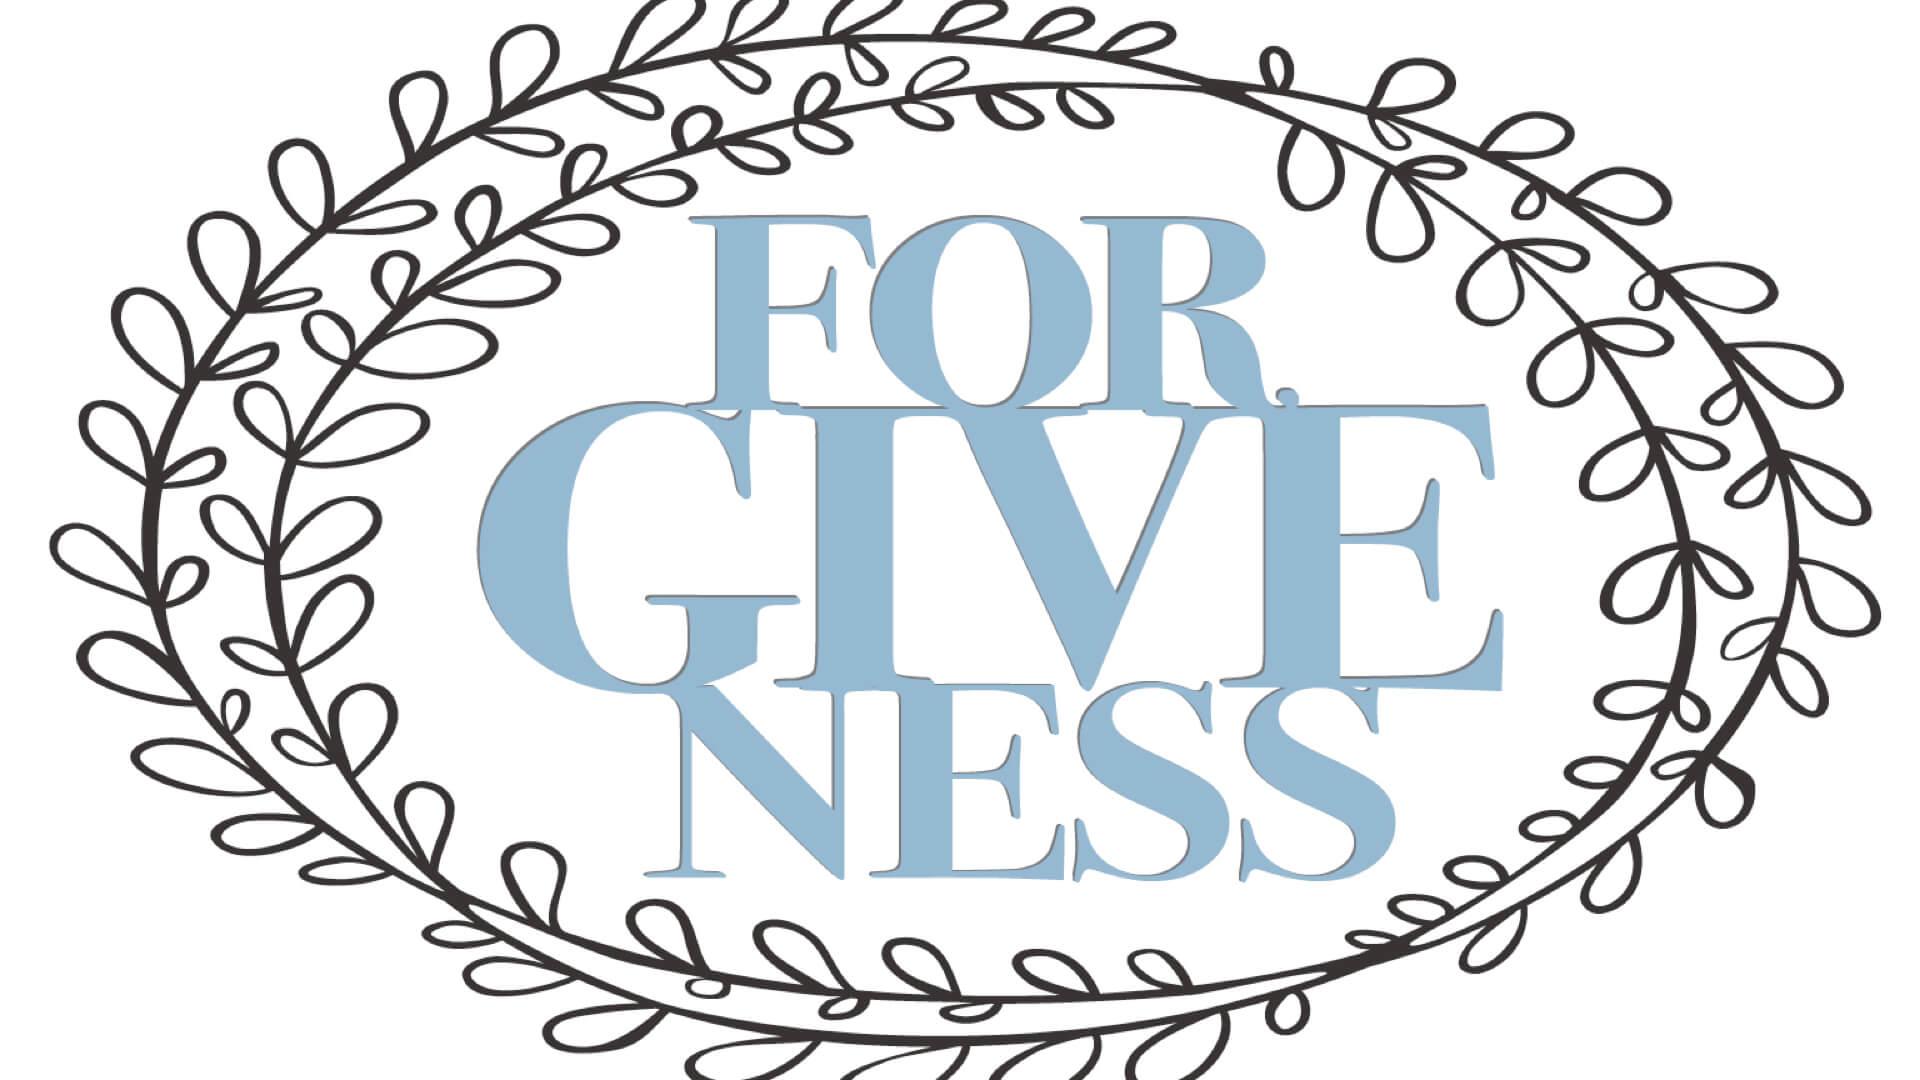 Forgiveness: Week Three